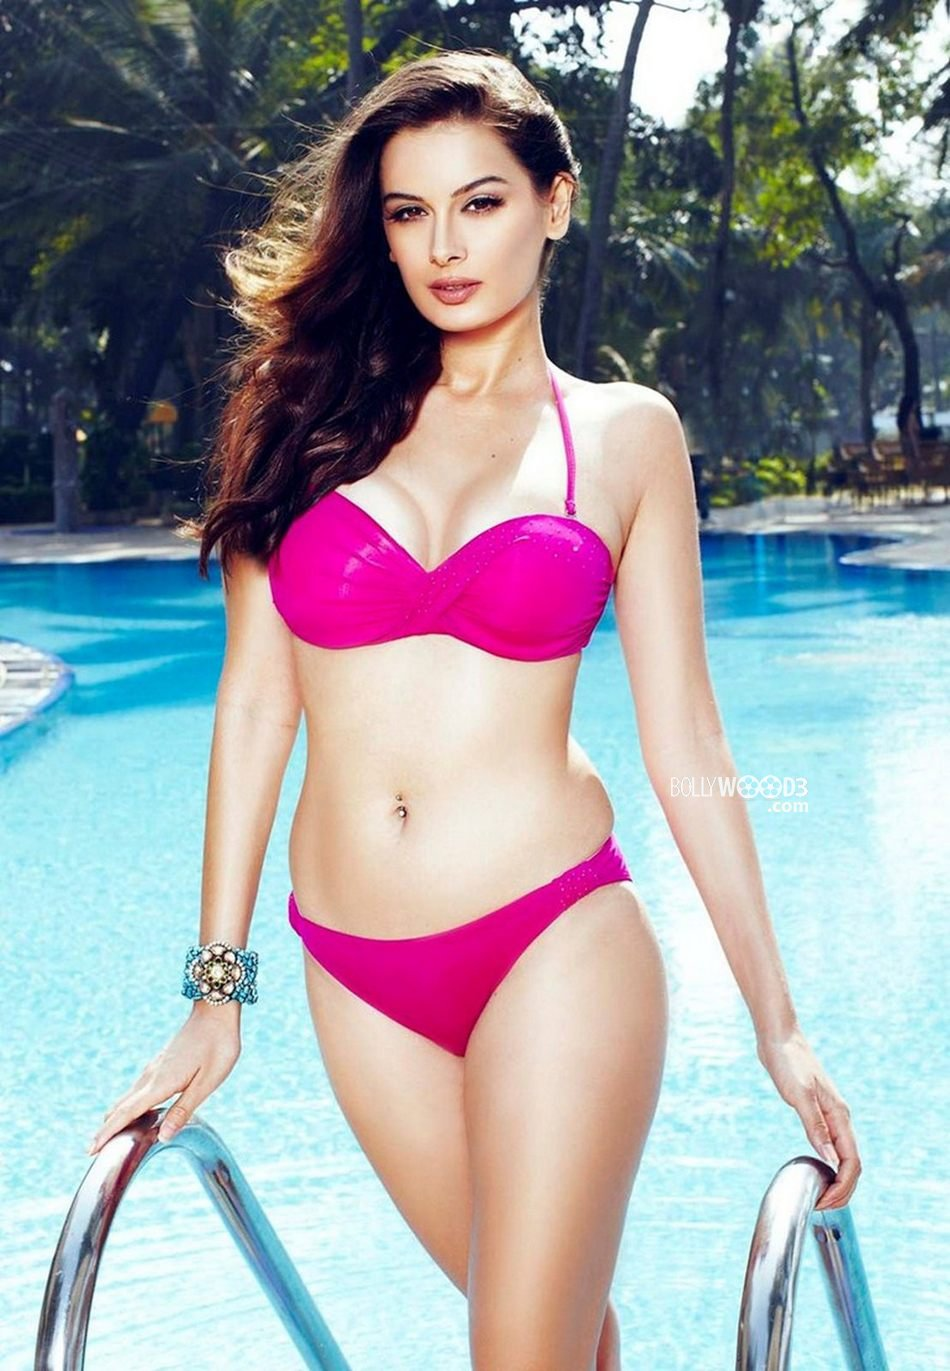 http://www.bollywood3.com/Slideshows/Hot_Photos/E/Evelyn_Sharma_Bikini_Photoshoot/images/Evelyn_Sharma_in_Bikini%20(1).jpg